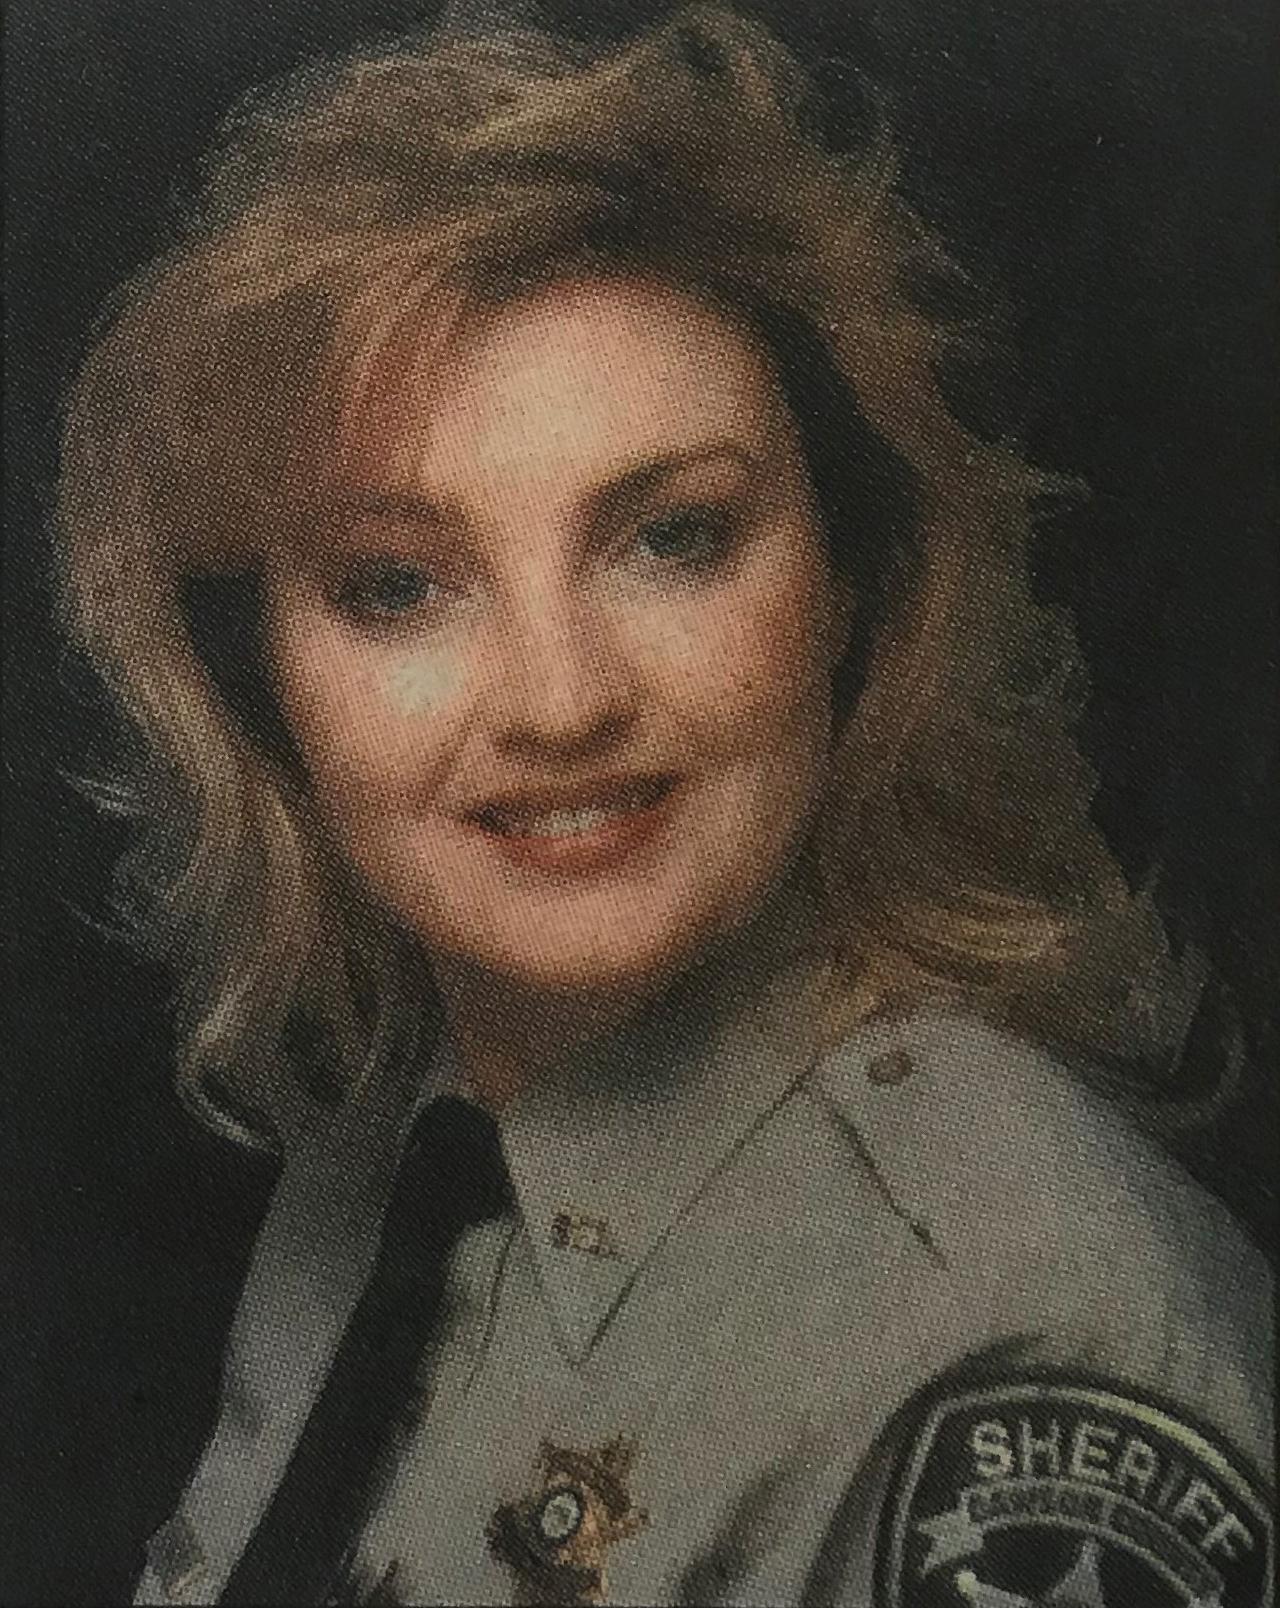 Detention Officer Bobbie Sue Hoenie | Dawson County Sheriff's Office, Georgia